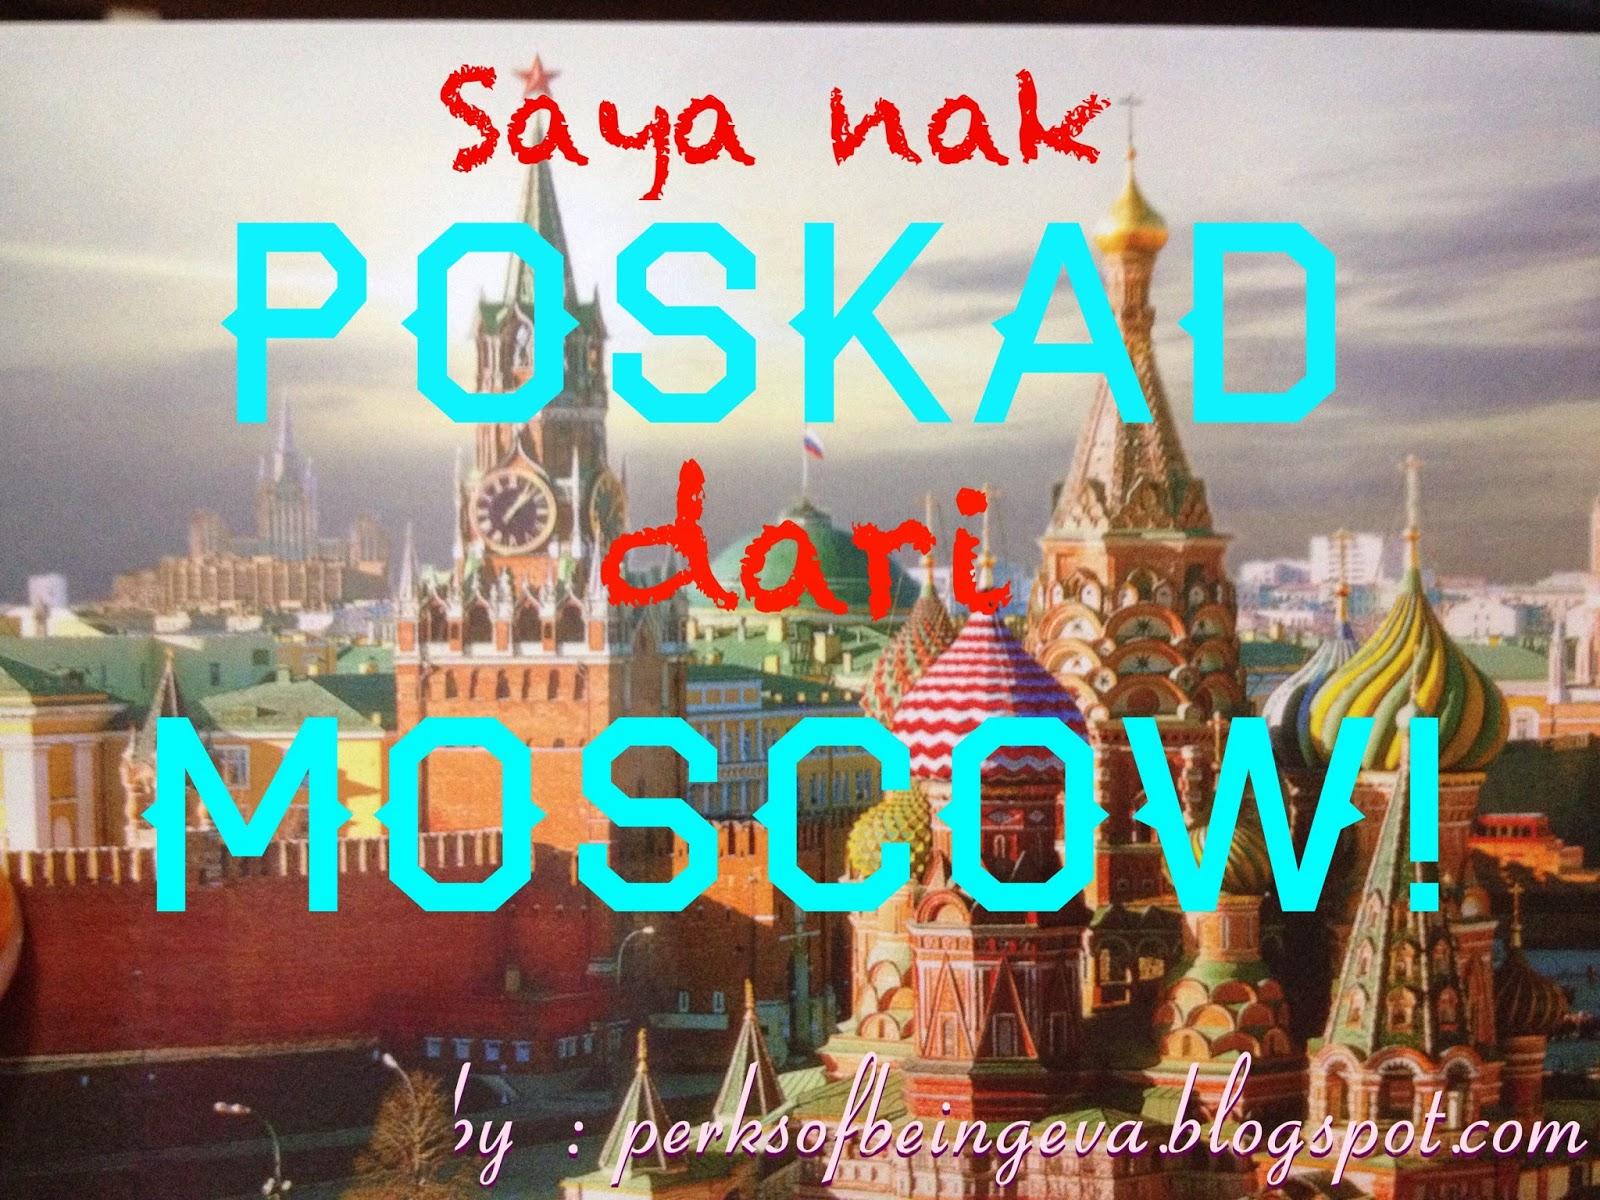 http://perksofbeingeva.blogspot.com/2014/08/giveaway-saya-nak-poskad-dari-moscow.html